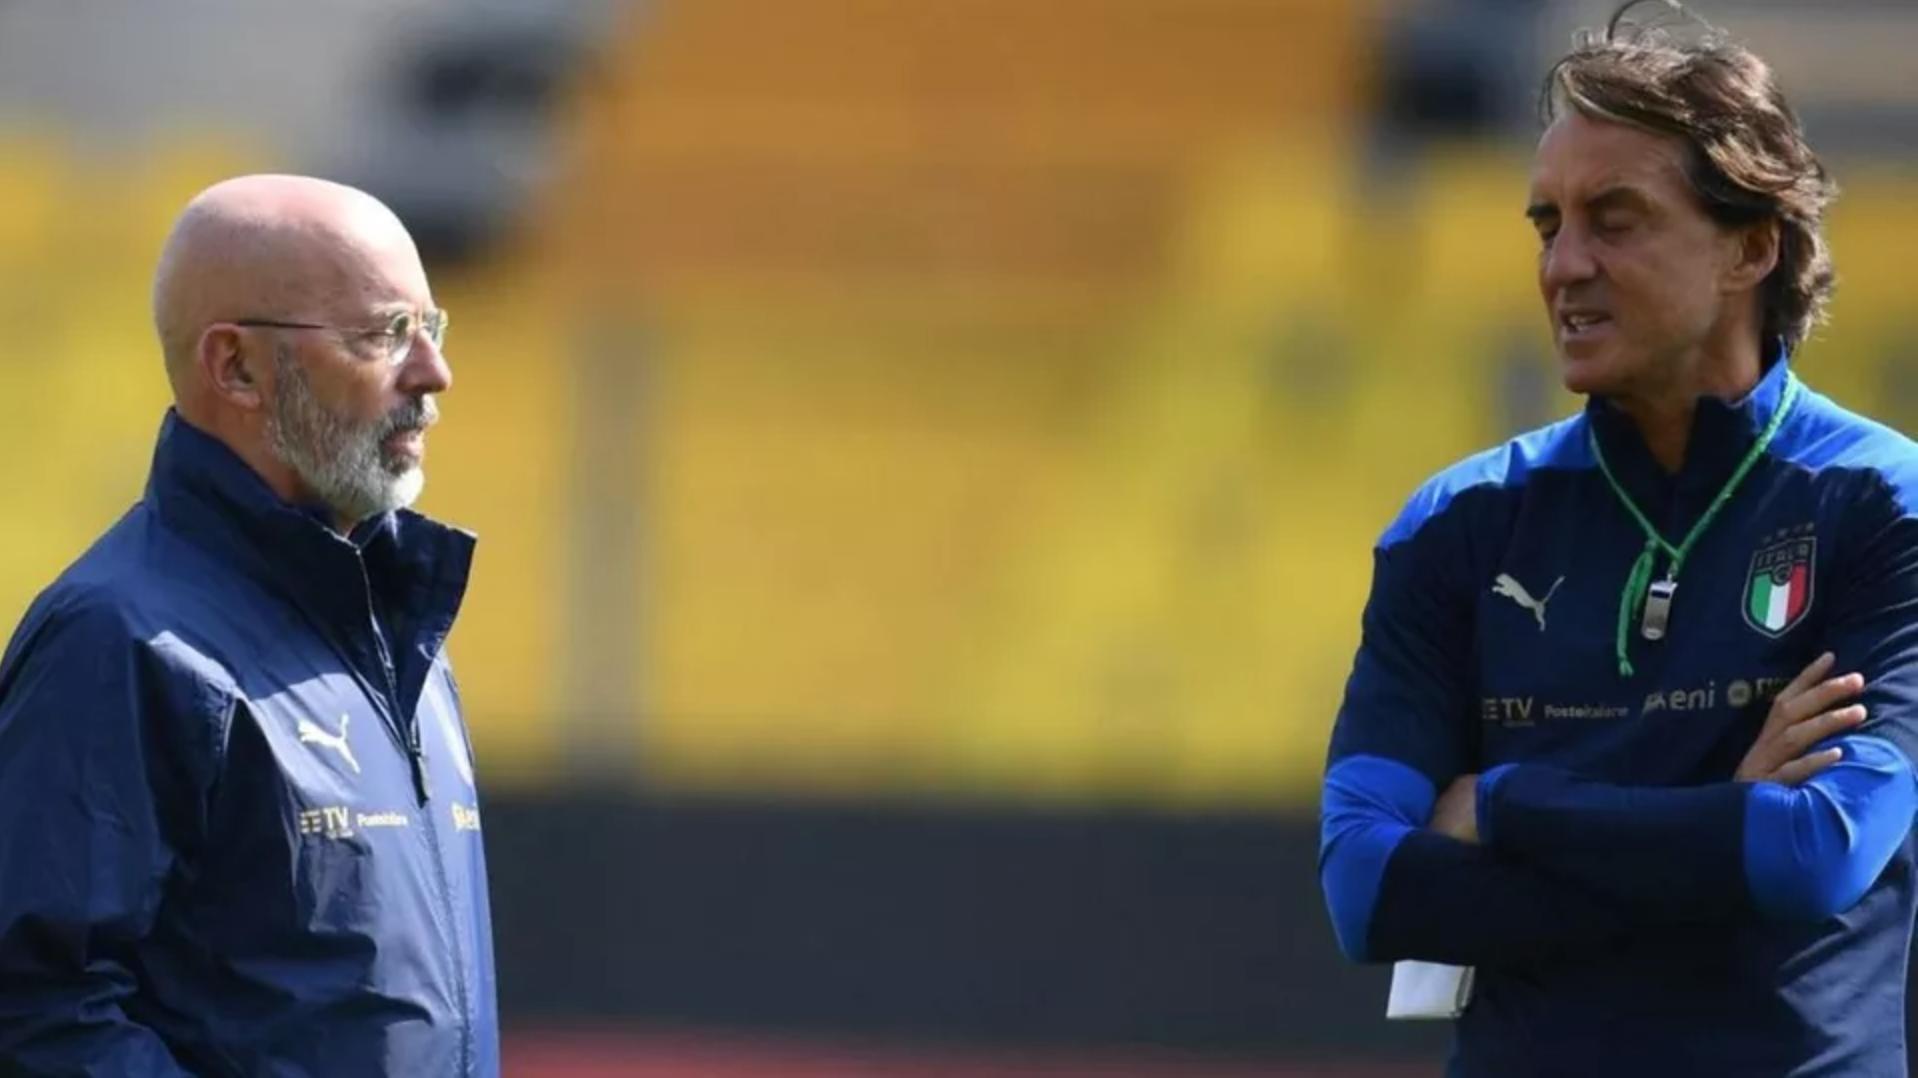 Gianni Vio (kiri) dalam pertukaran dengan Mancini di tempat latihan Italia.  Foto: Nuova Venezia